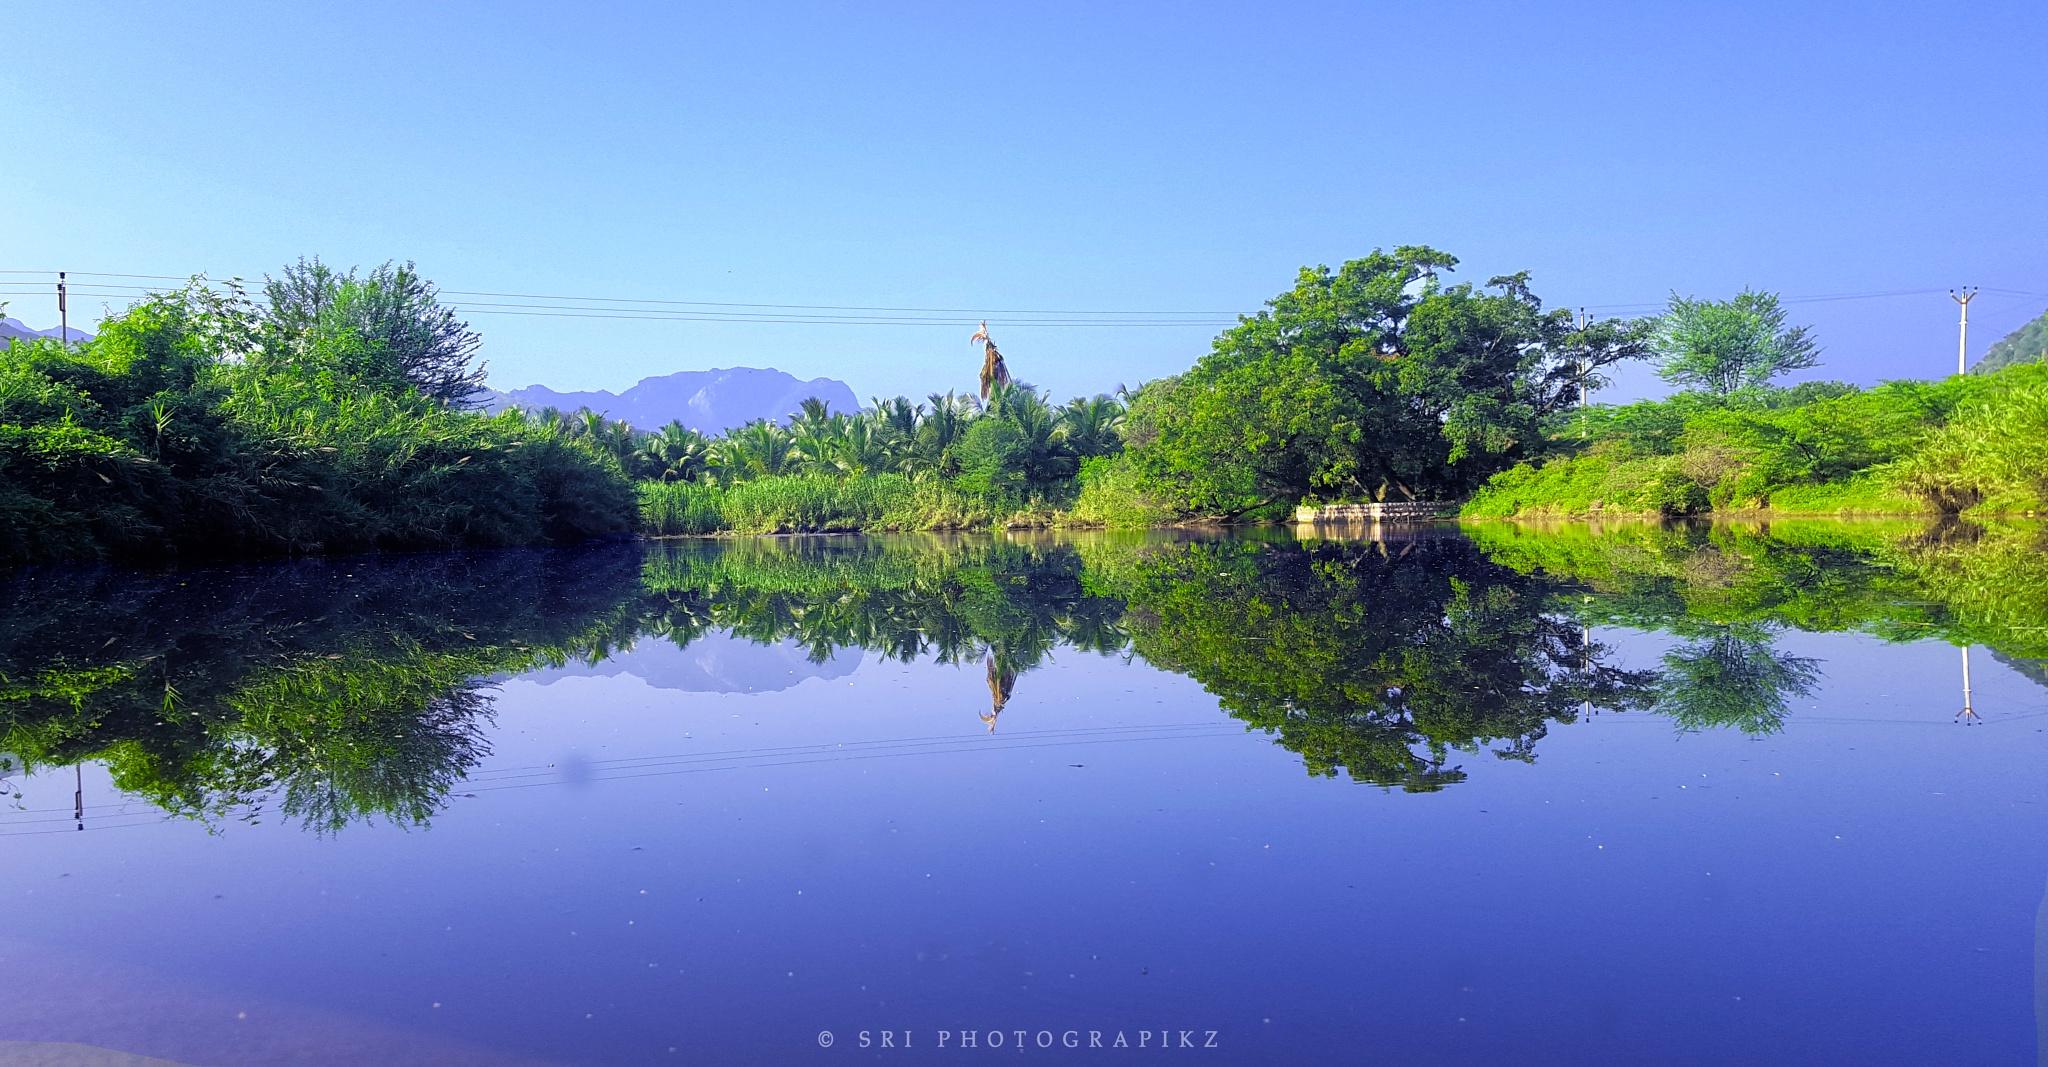 Reflection  by Jawahar srinath